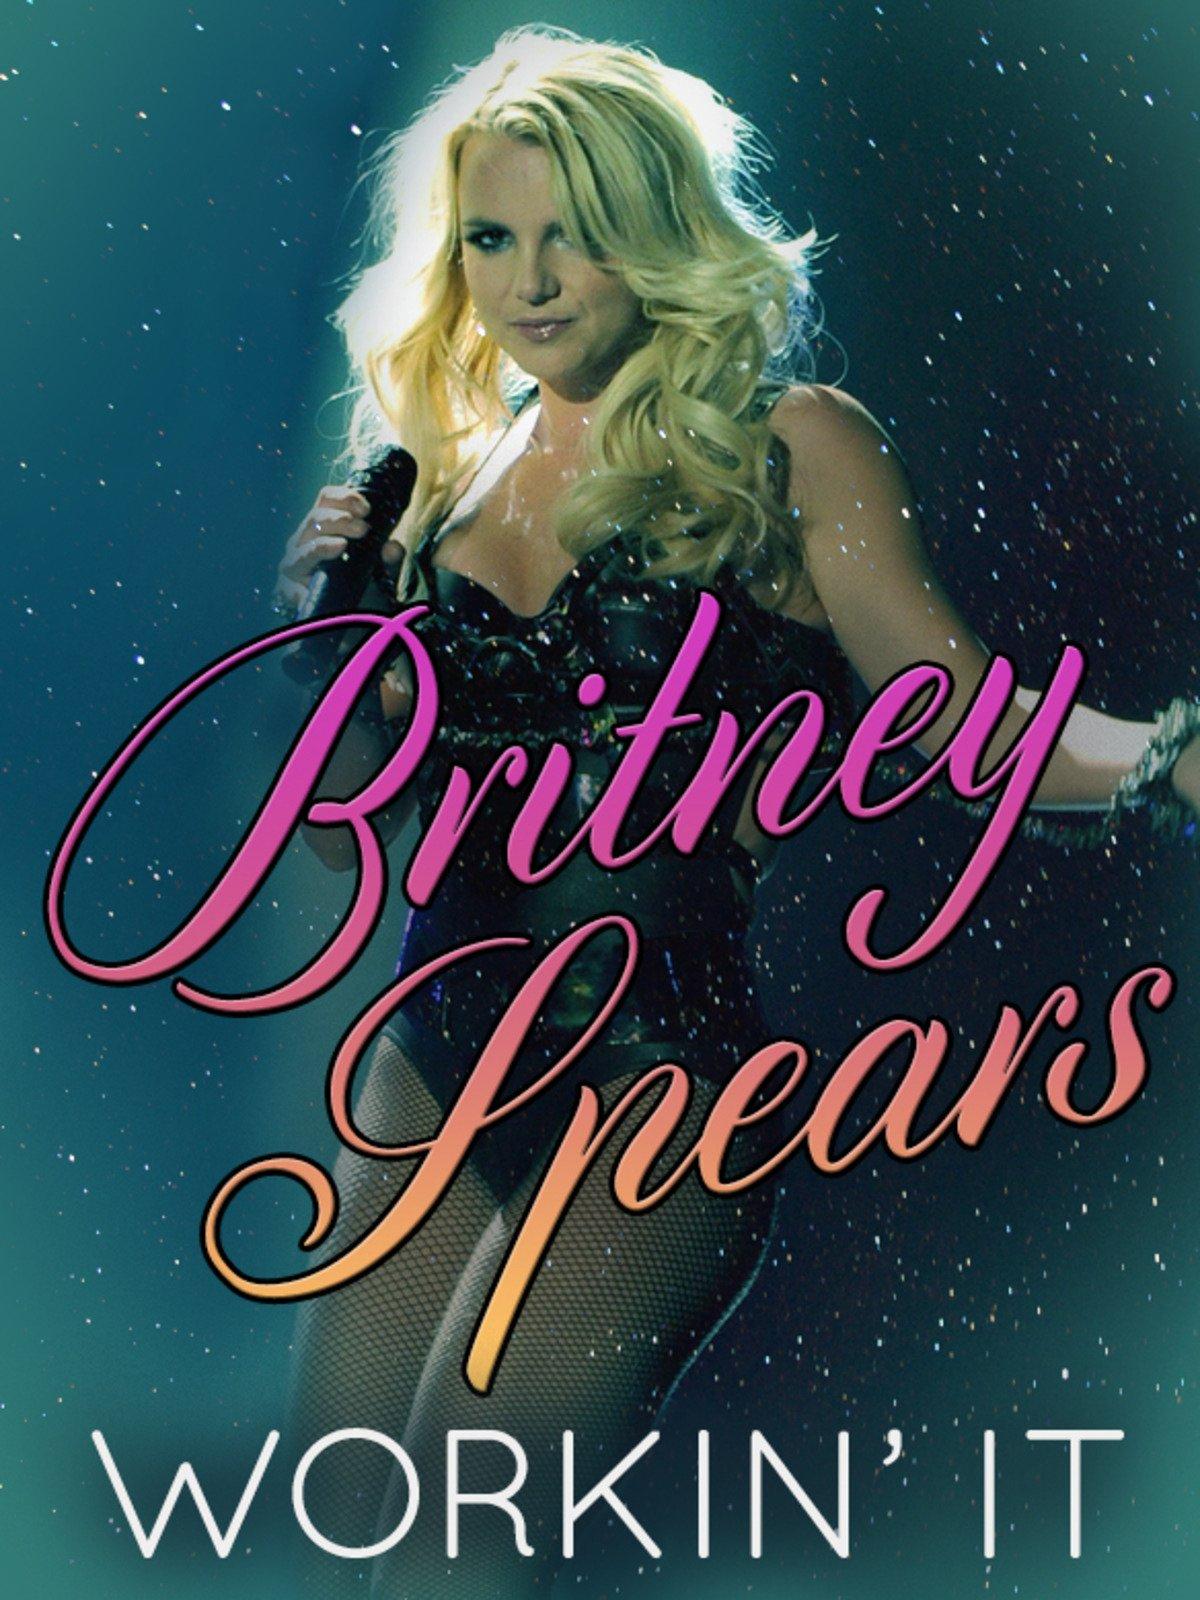 Britney Spears: Workin' It on Amazon Prime Video UK